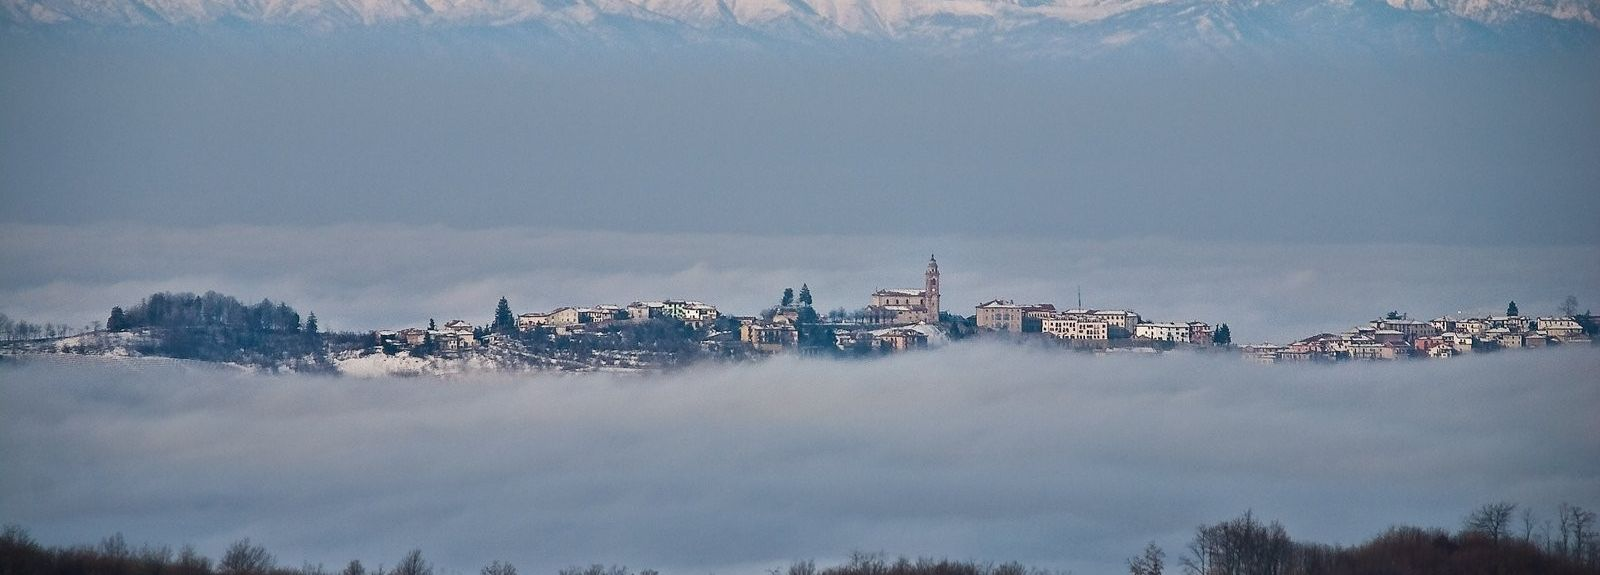 Loazzolo, Asti, Piedmont, Italy